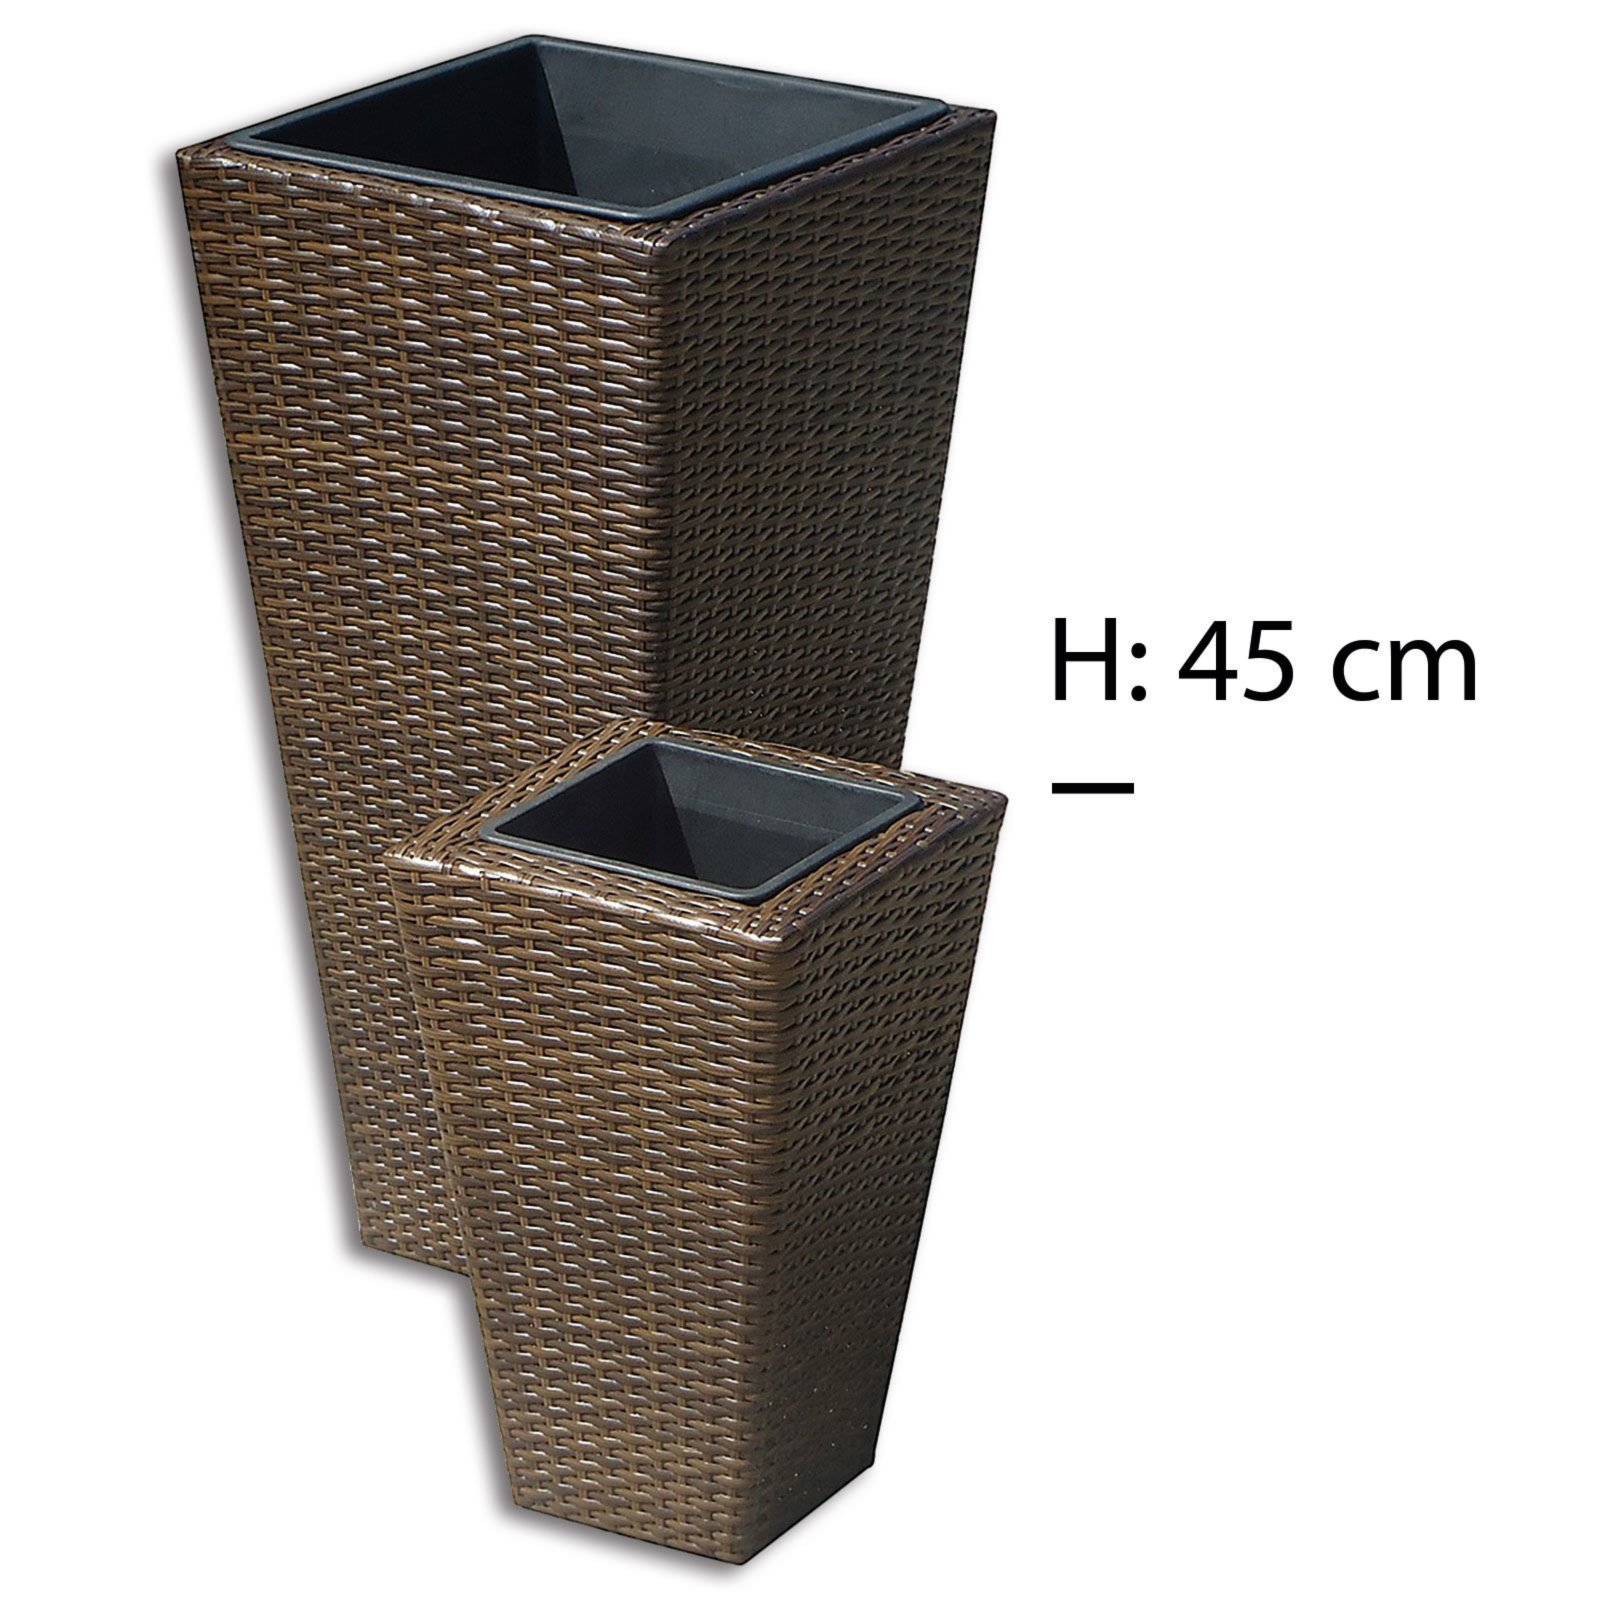 pflanzk bel braun rattan optik h he 45 cm. Black Bedroom Furniture Sets. Home Design Ideas